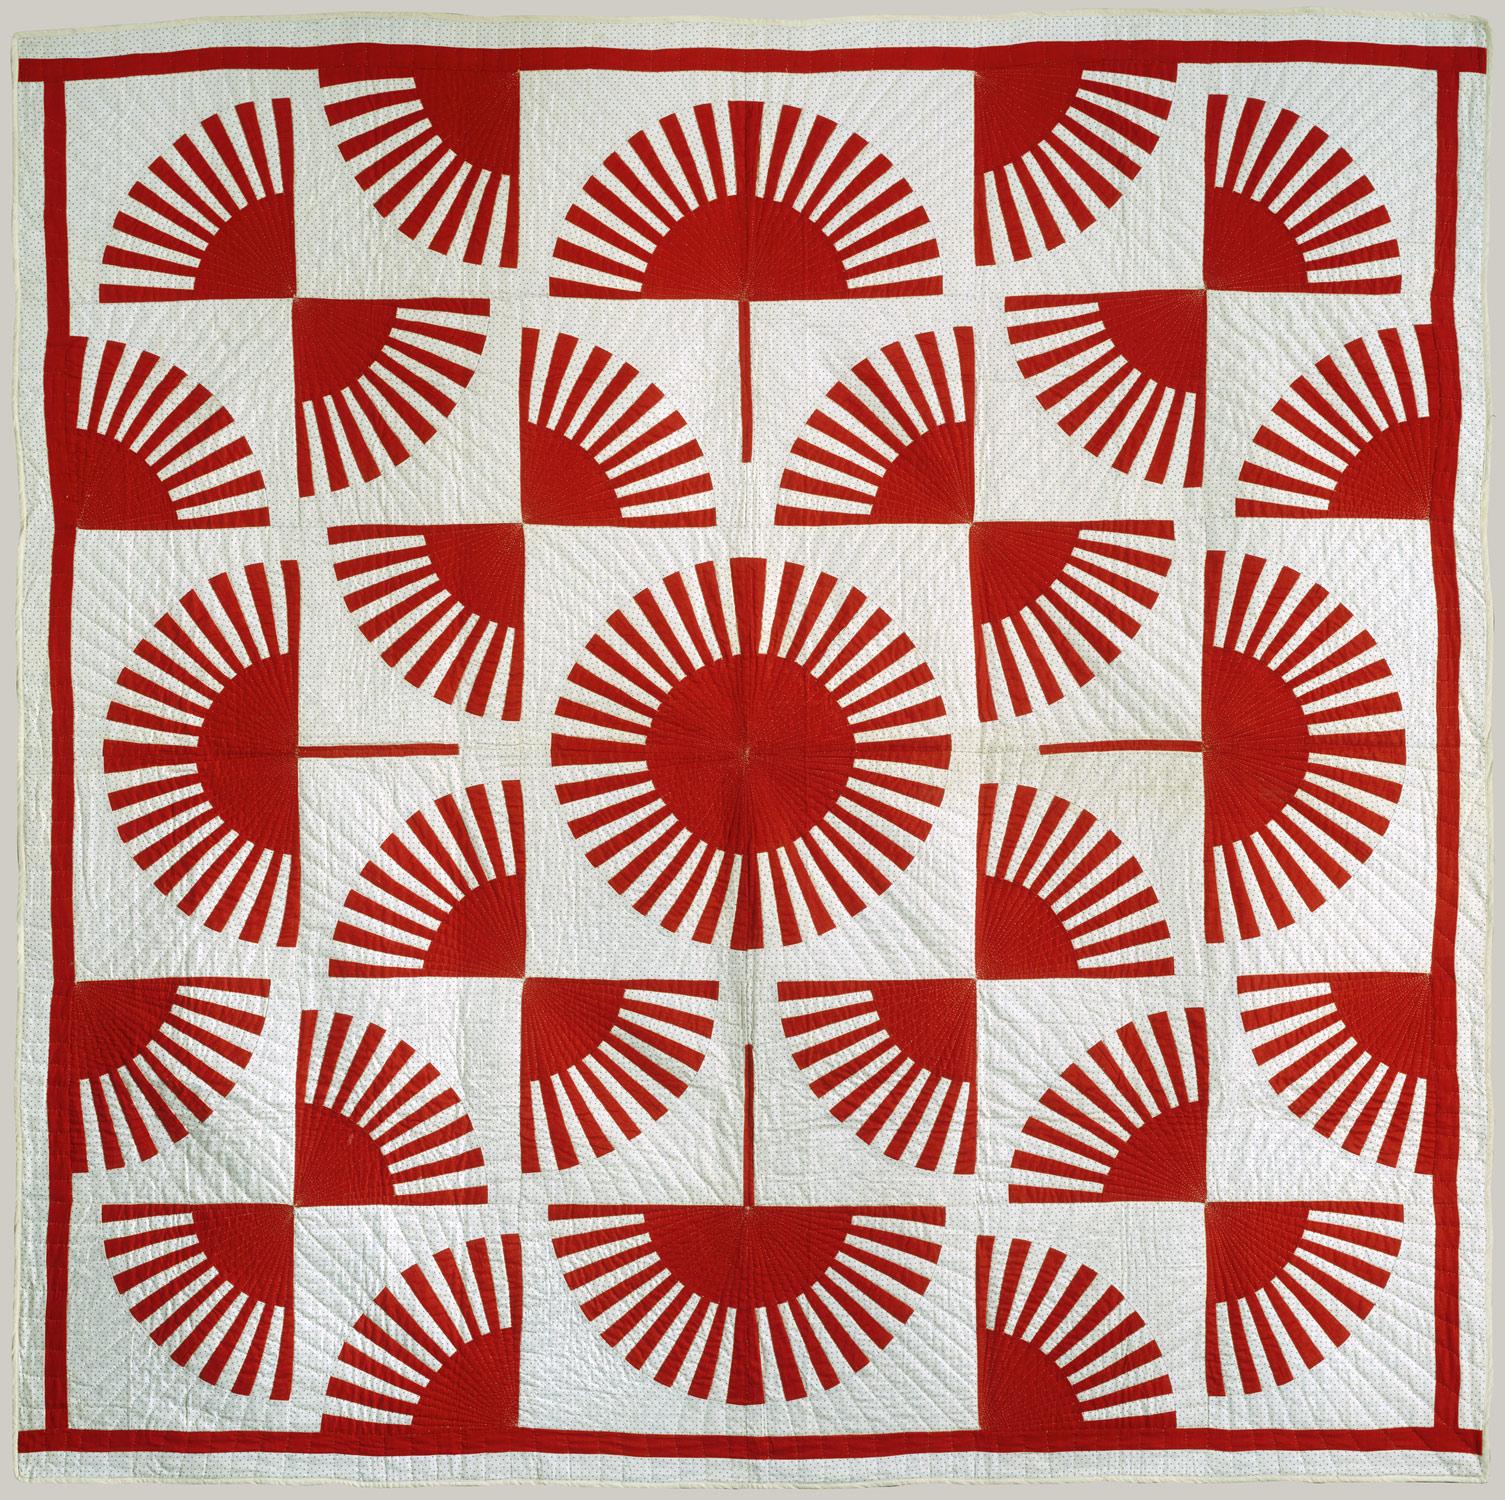 quilt fan pattern work of art heilbrunn timeline of art history